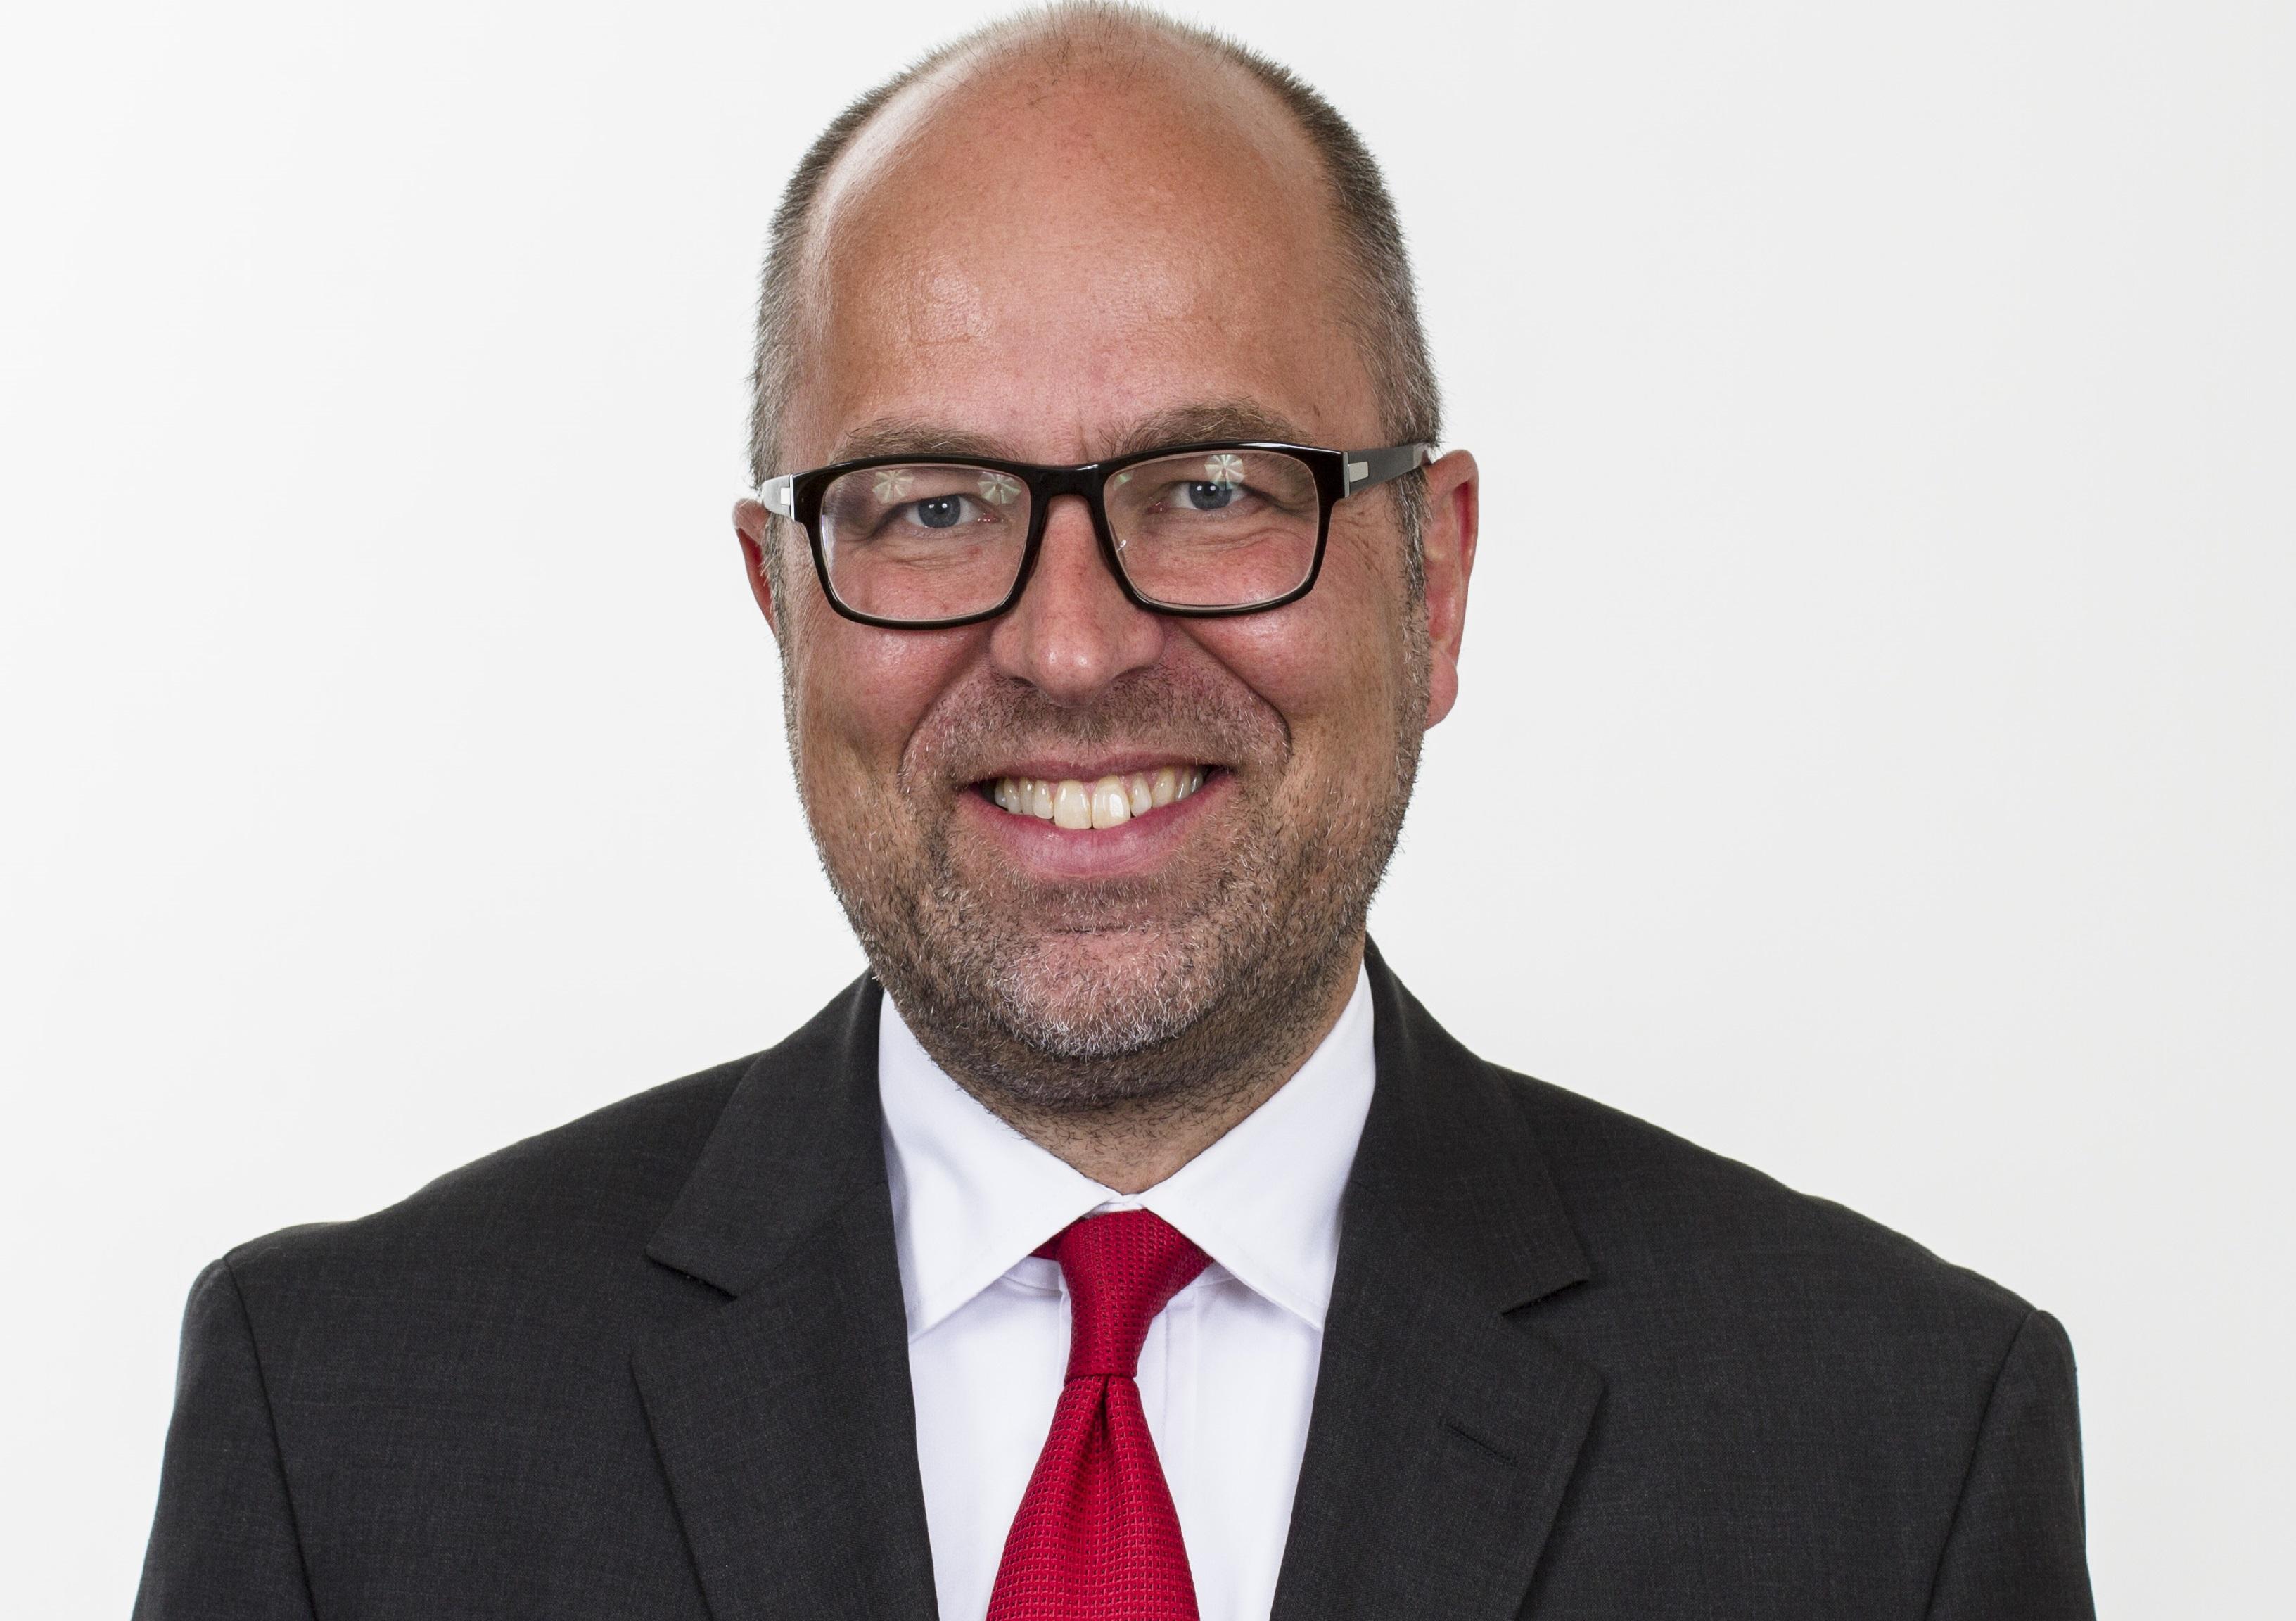 Prof. Dr. Stephan Rüschen Professor für Lebensmittelhandel/Food Retail Duale Hochschule Baden-Württemberg Heilbronn